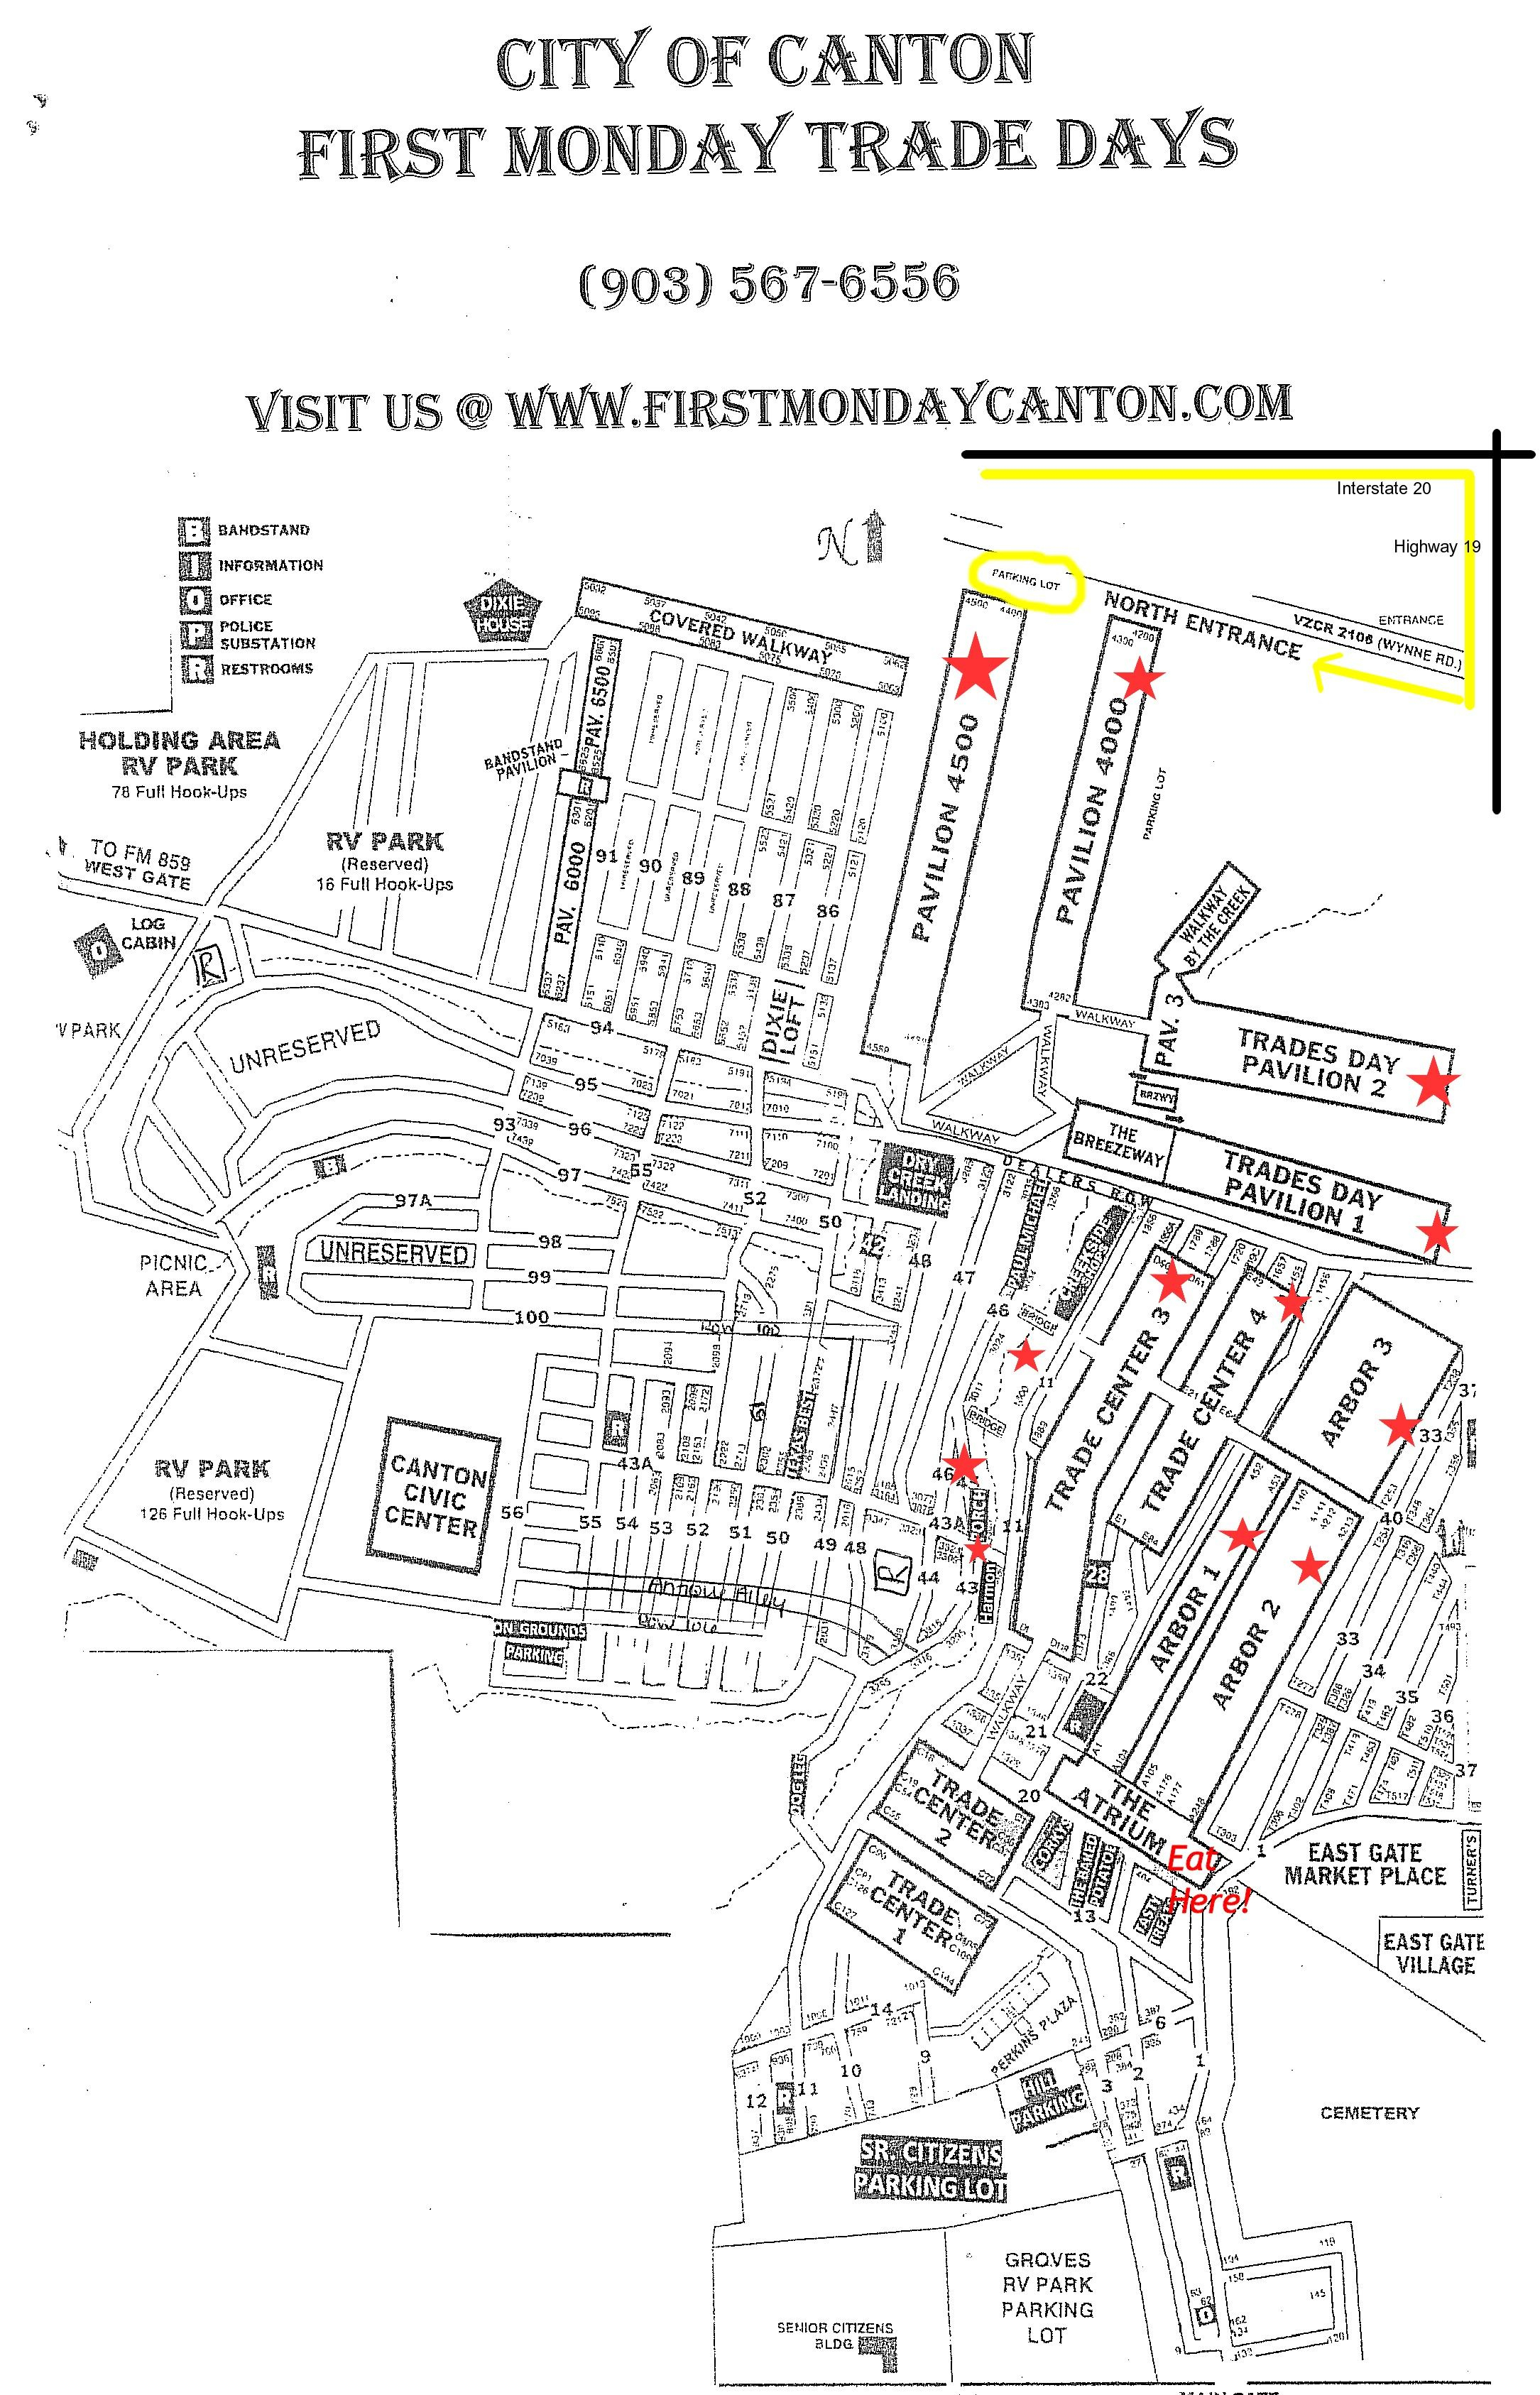 Tips When Visiting Canton First Monday Trade Days | Places I Wanna - Canton Texas Flea Market Map